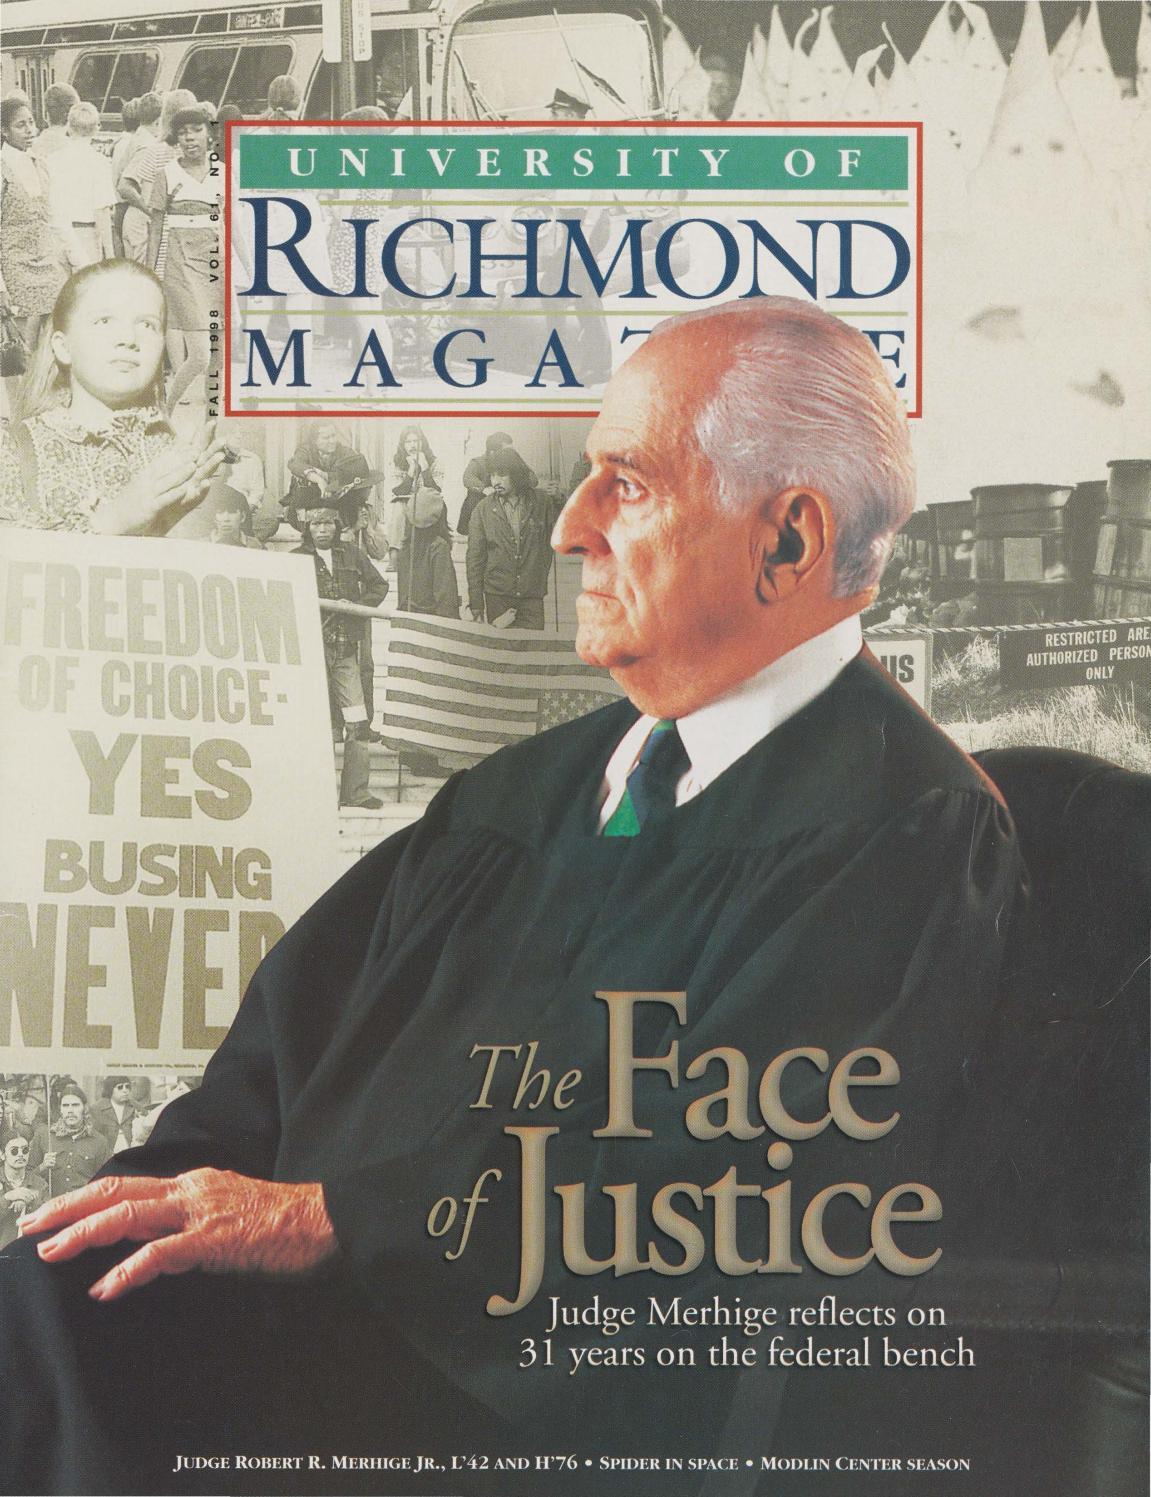 University of Richmond Magazine Fall 1998 by UR Scholarship